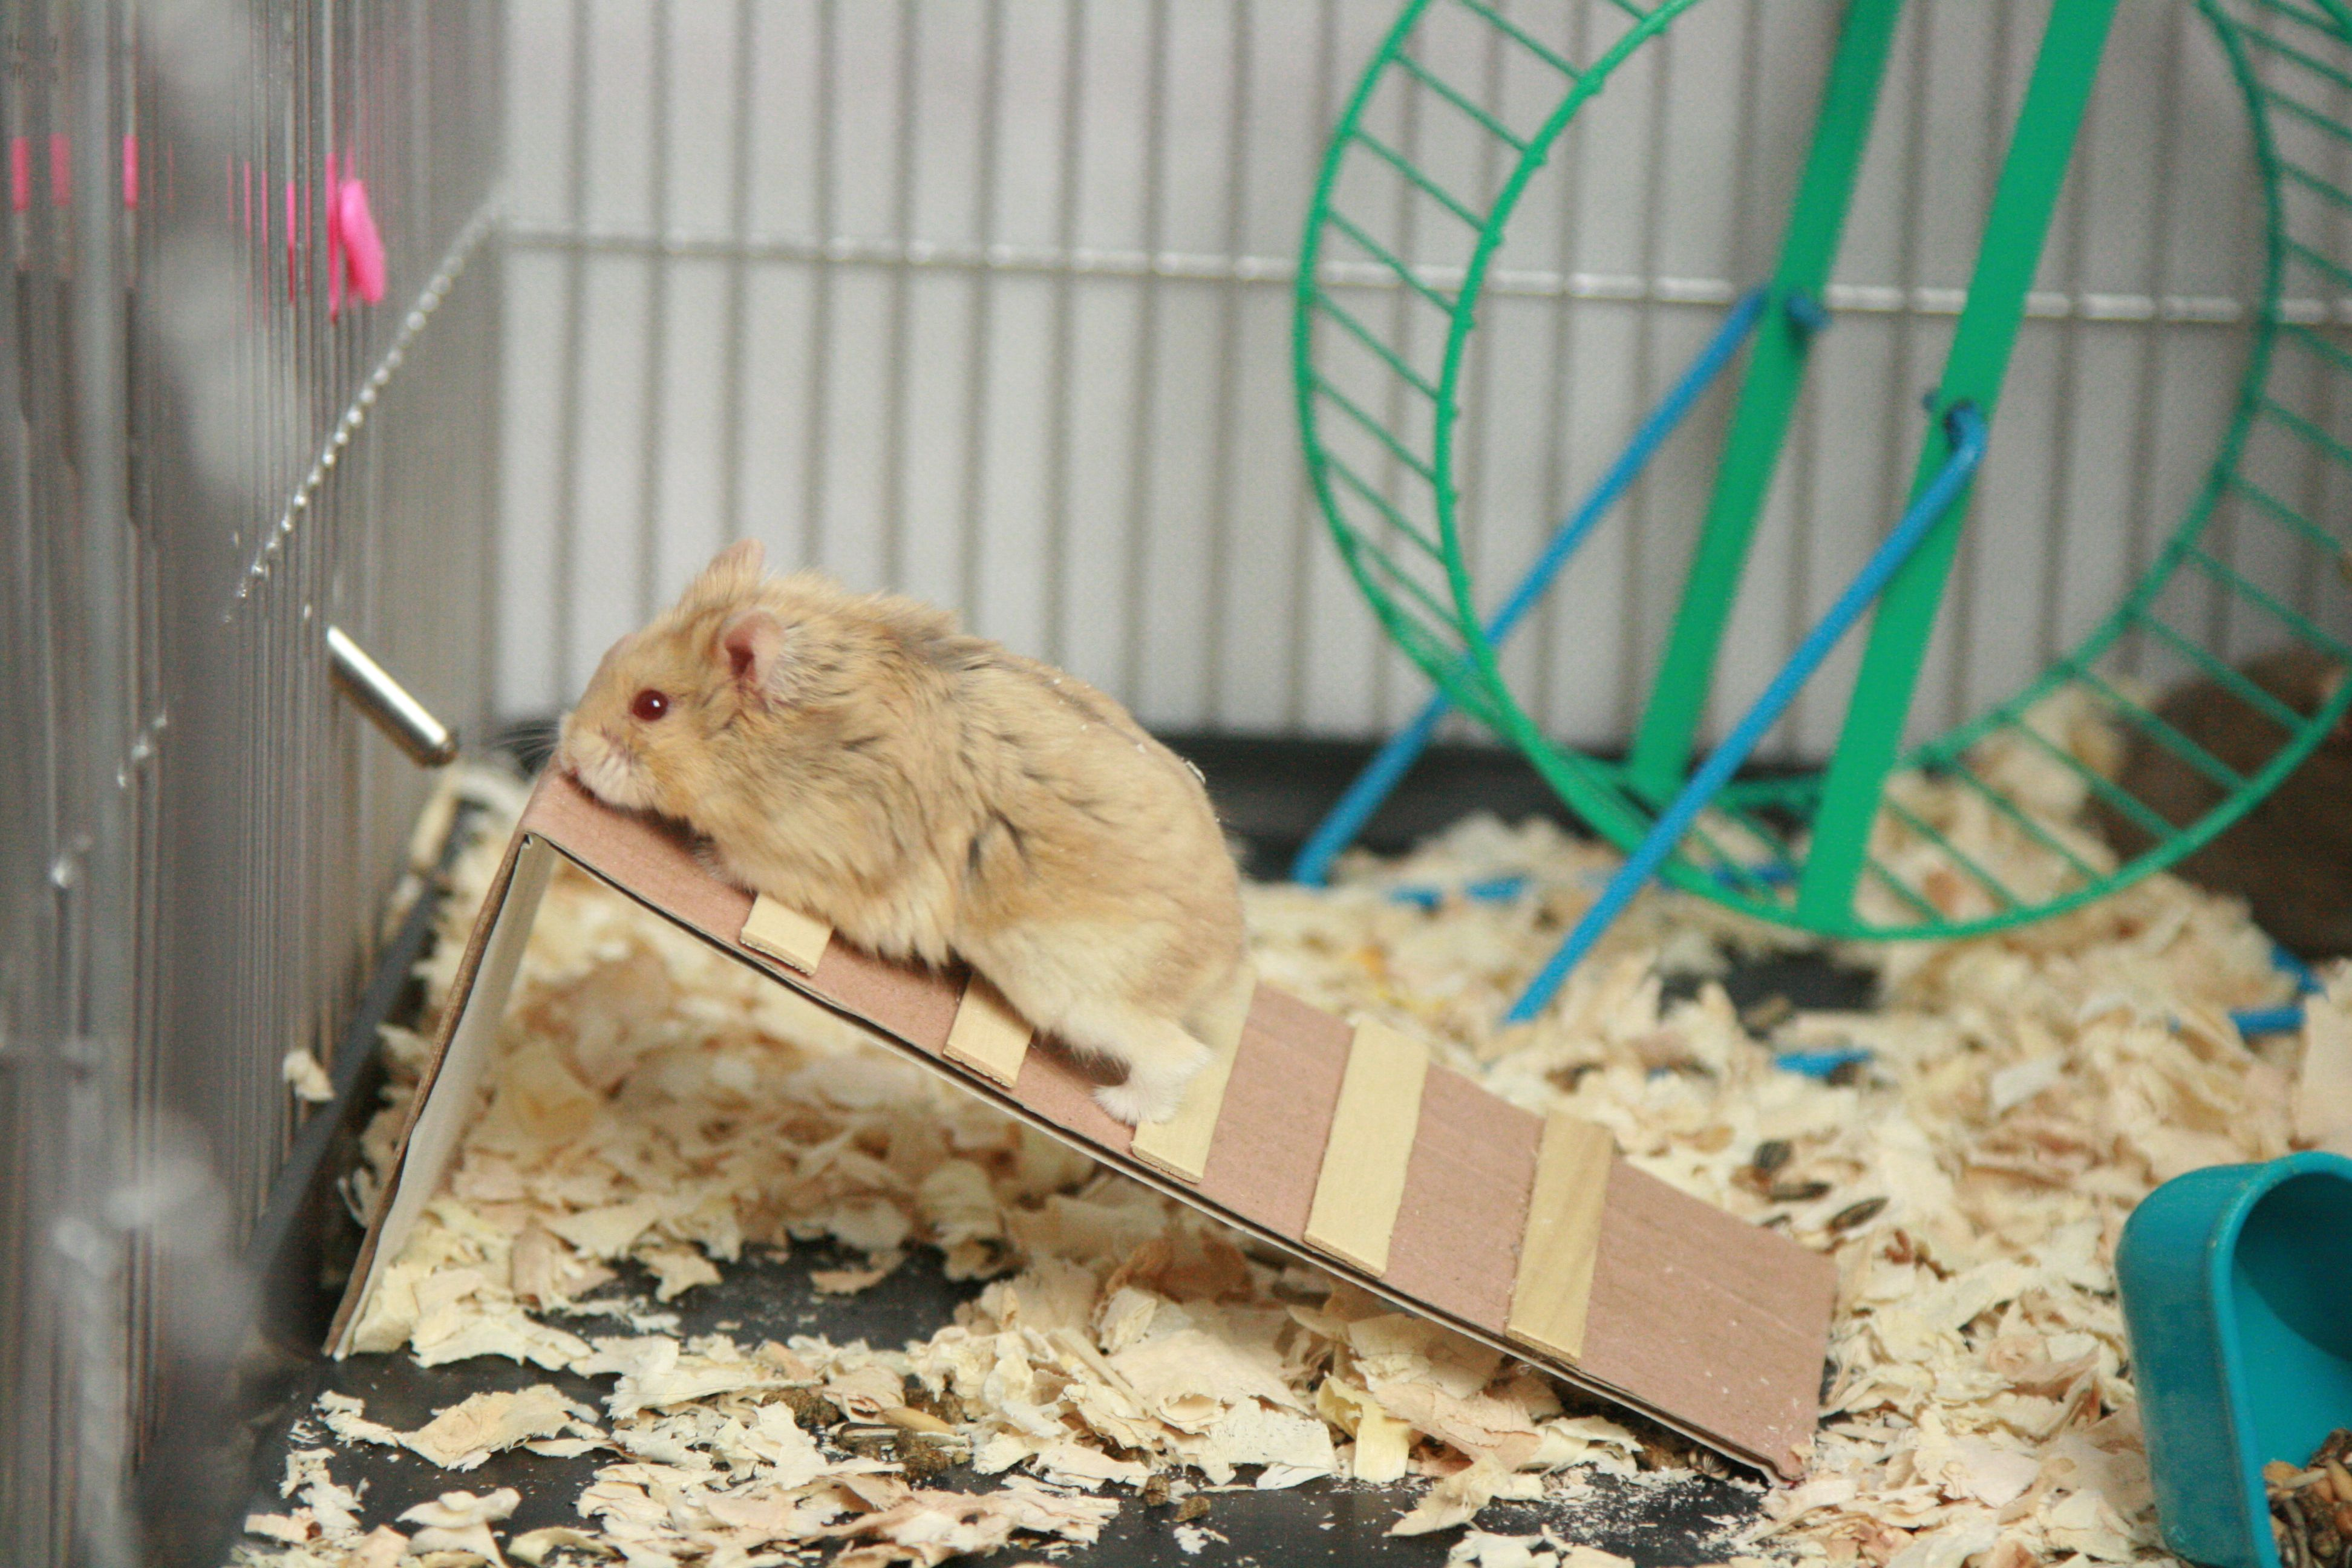 How To Make Toys For Hamsters Hamster Diy Hamster Toys Hamster